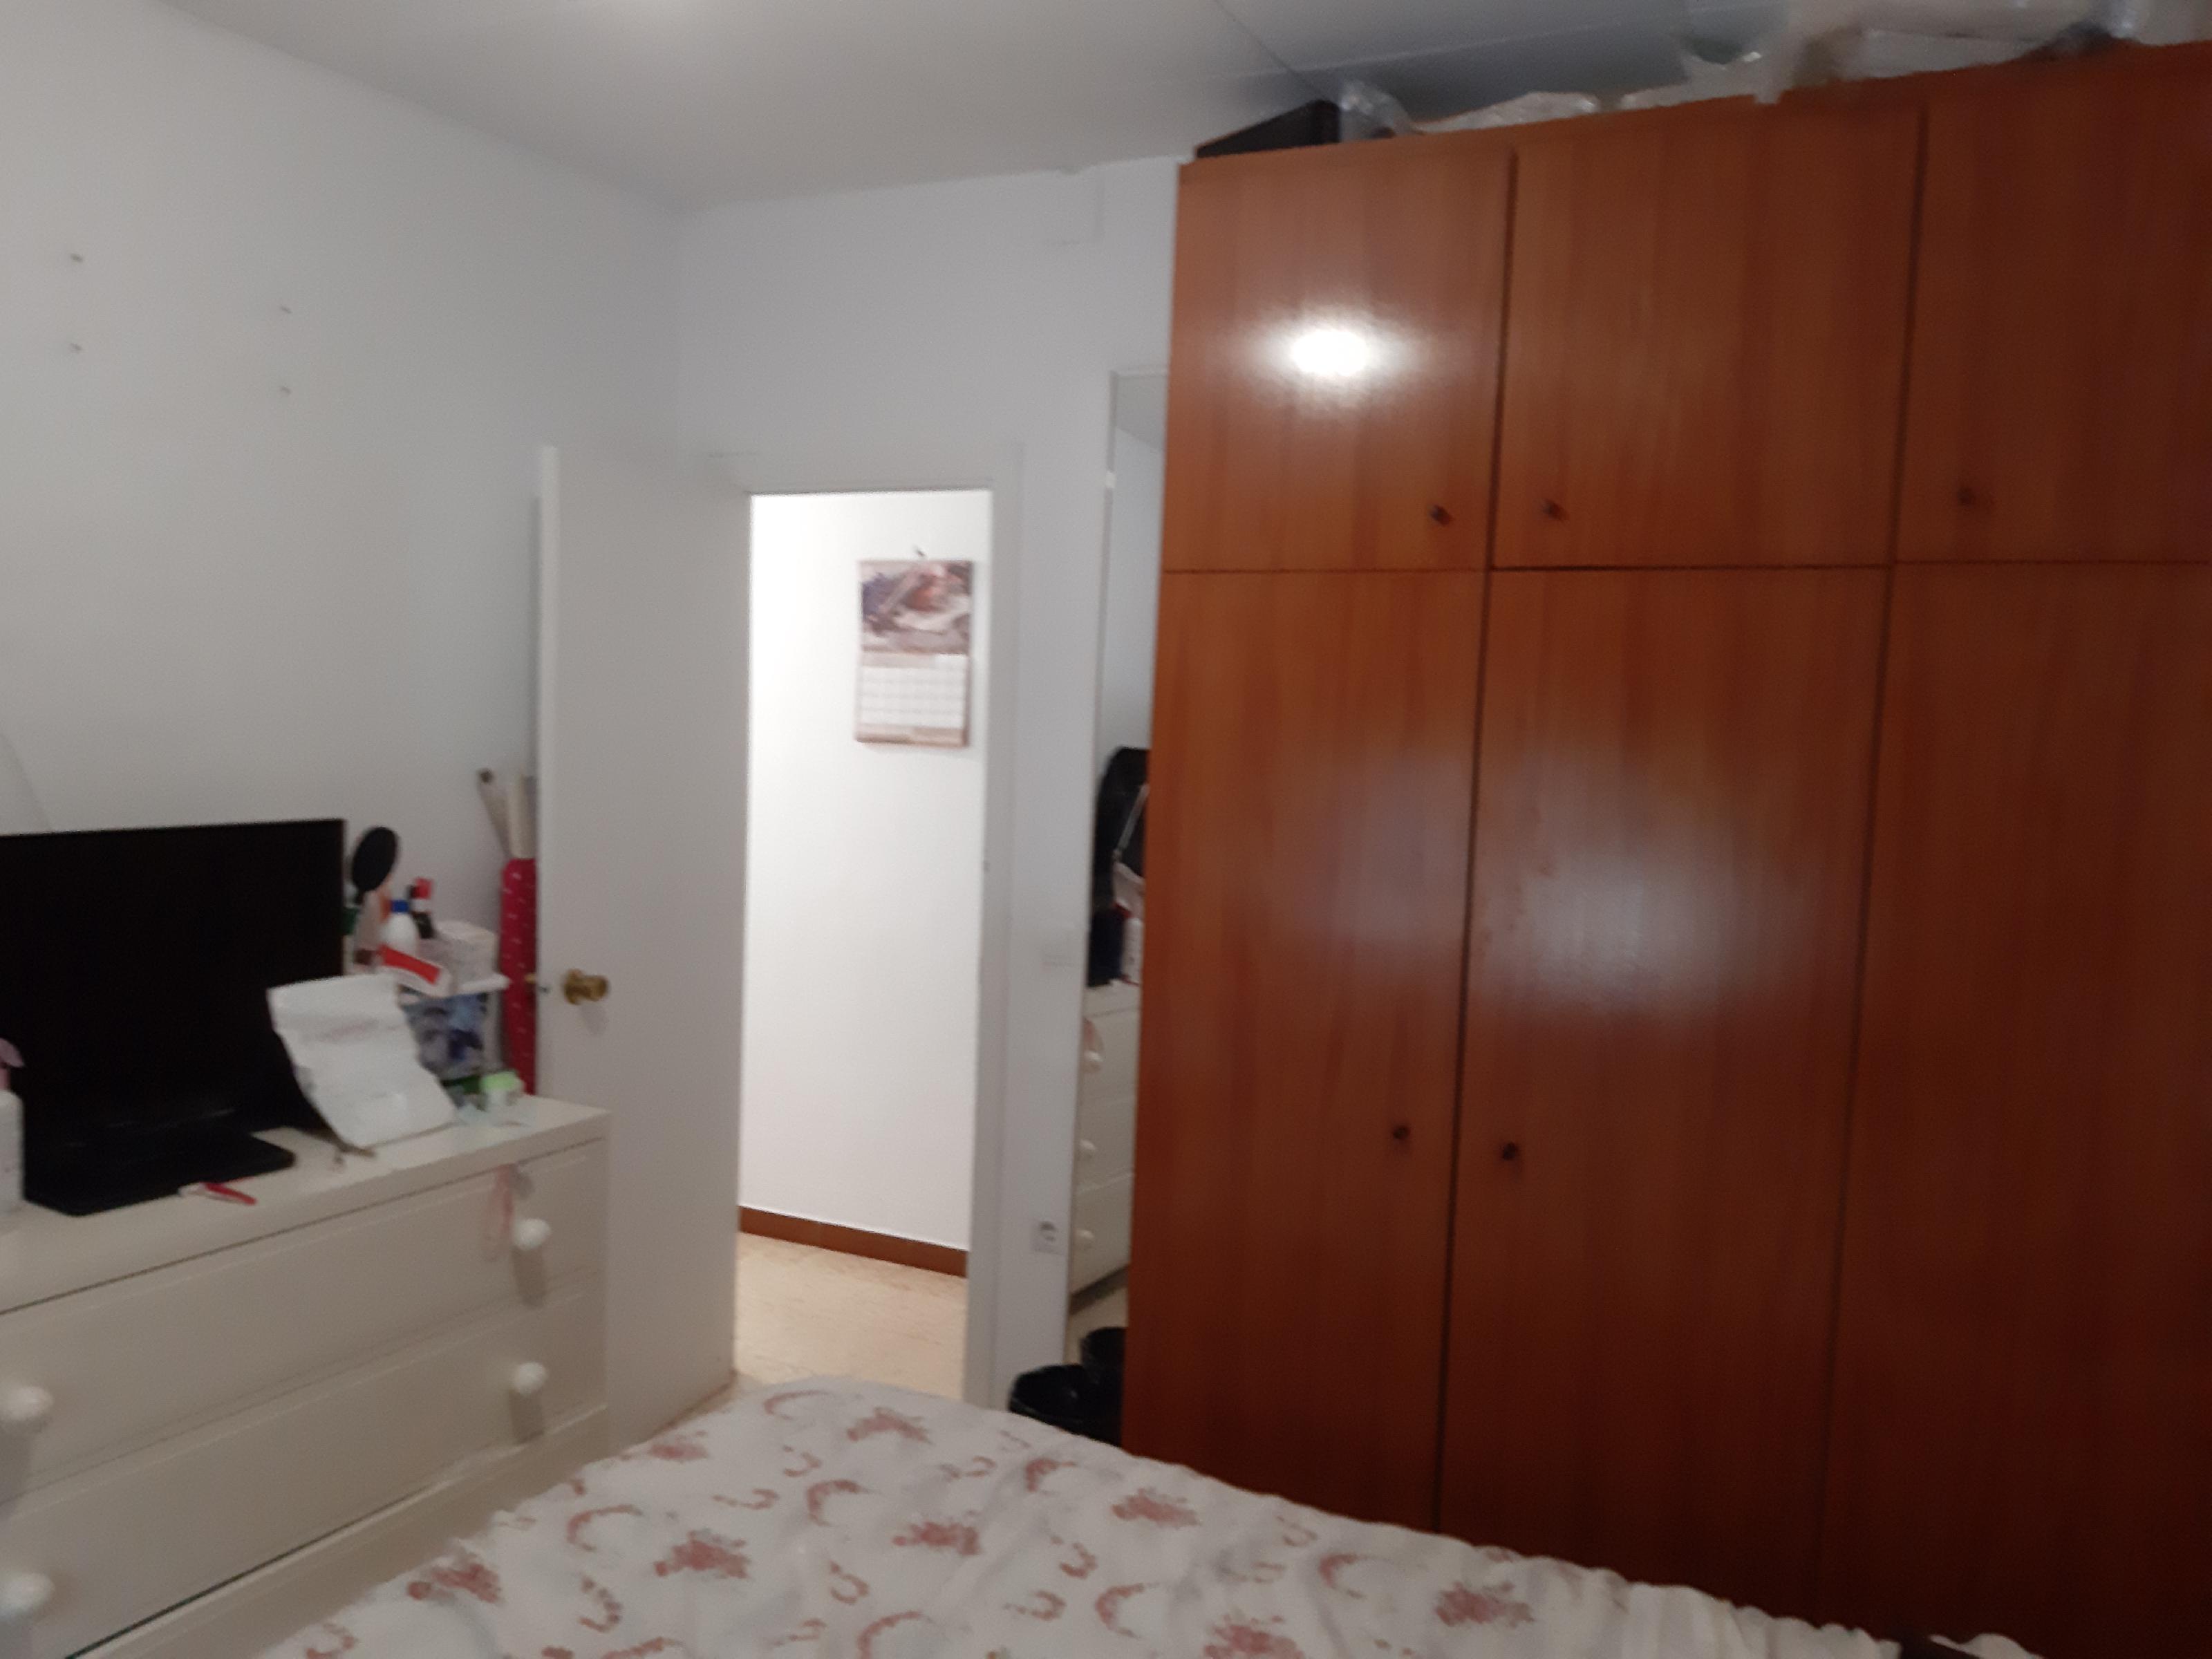 Imagen 4 Piso en venta en Santa Coloma De Gramenet / Cerca zona rambla fondo